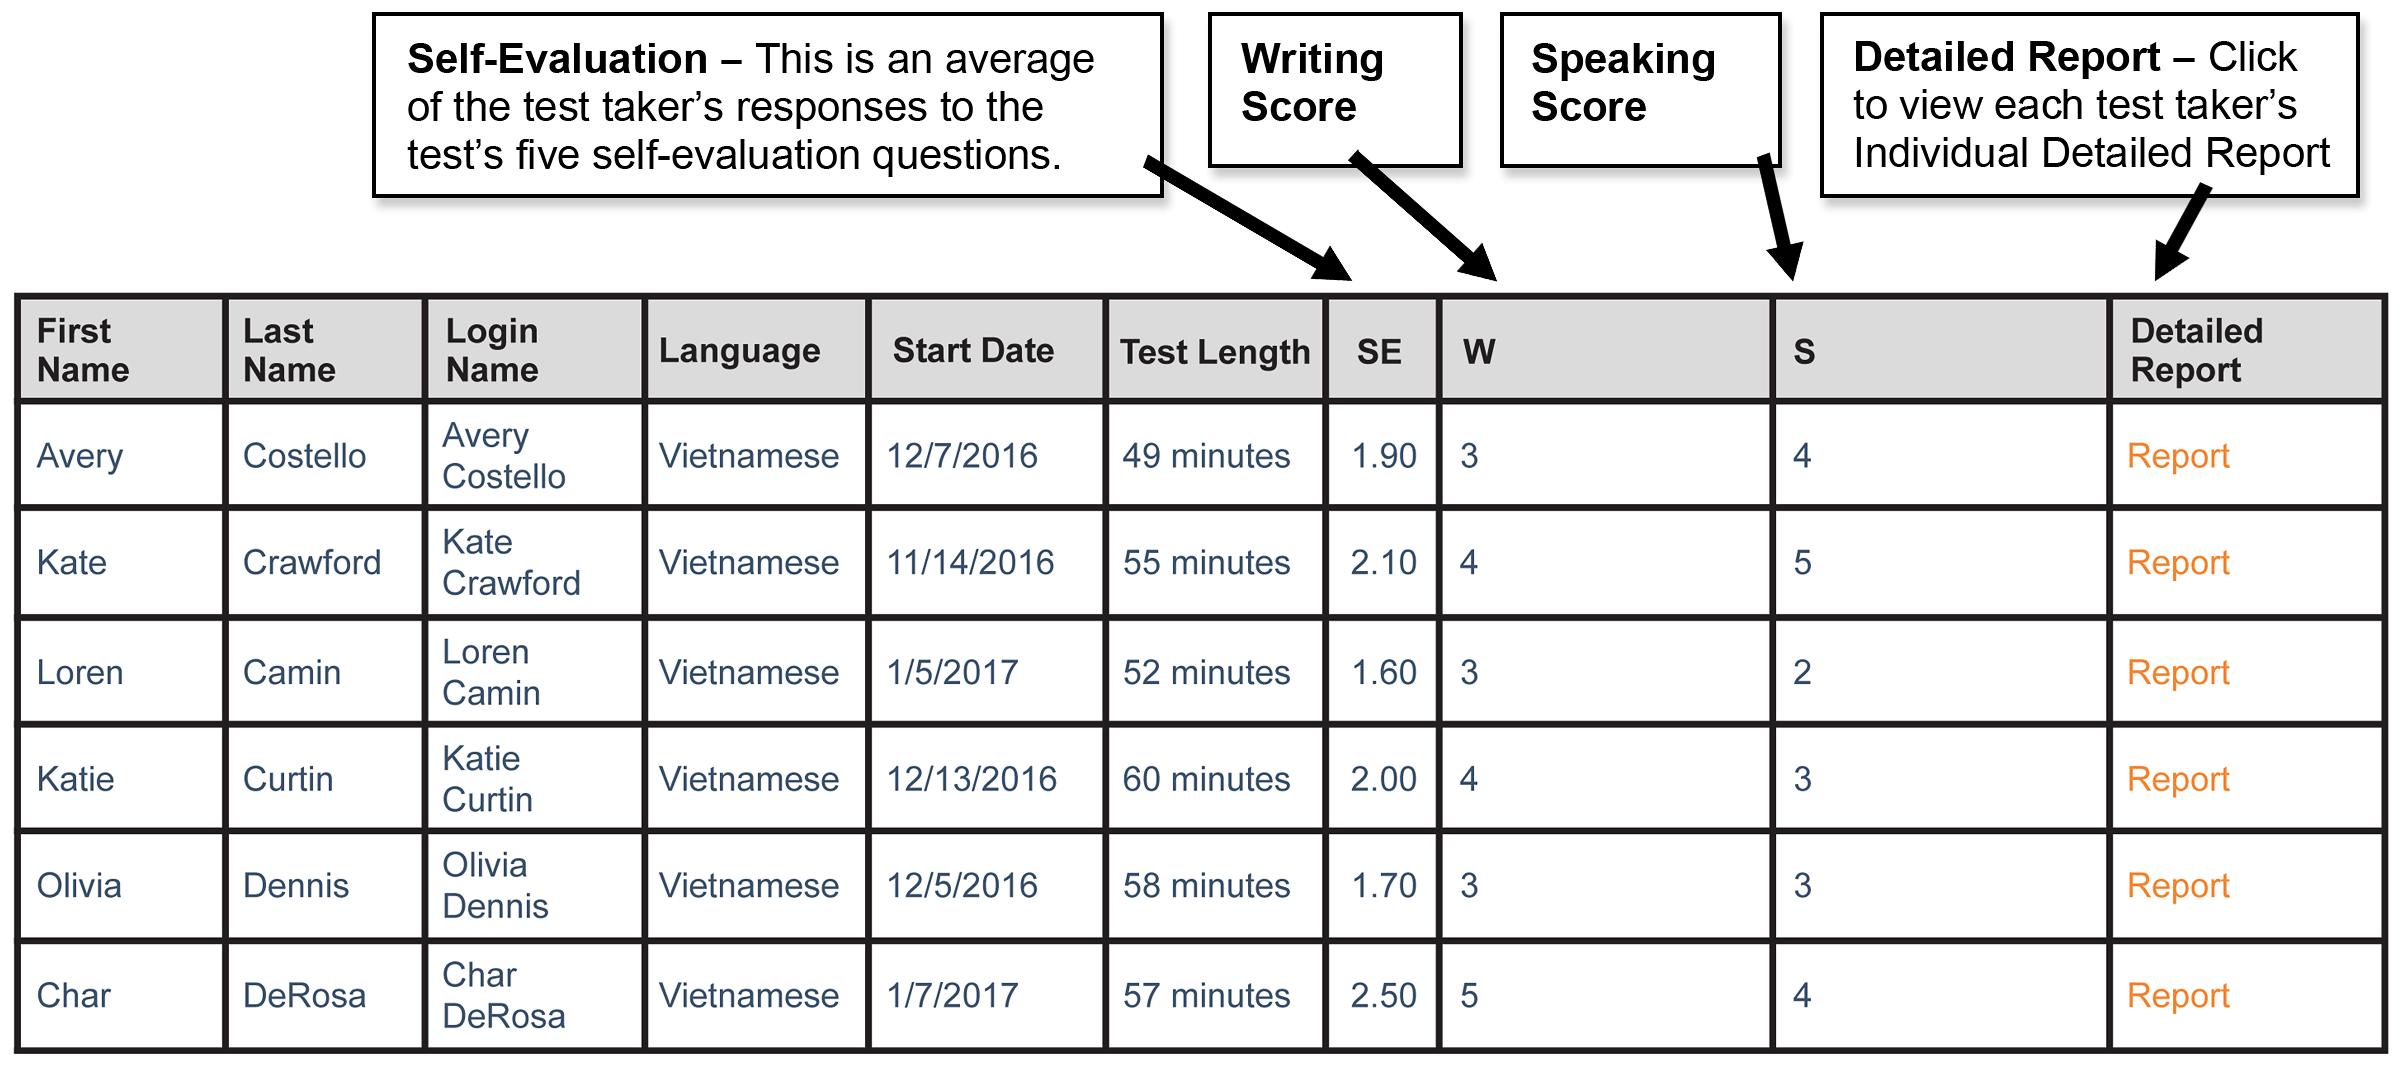 worldspeak-reporting-guide-summary-key.png